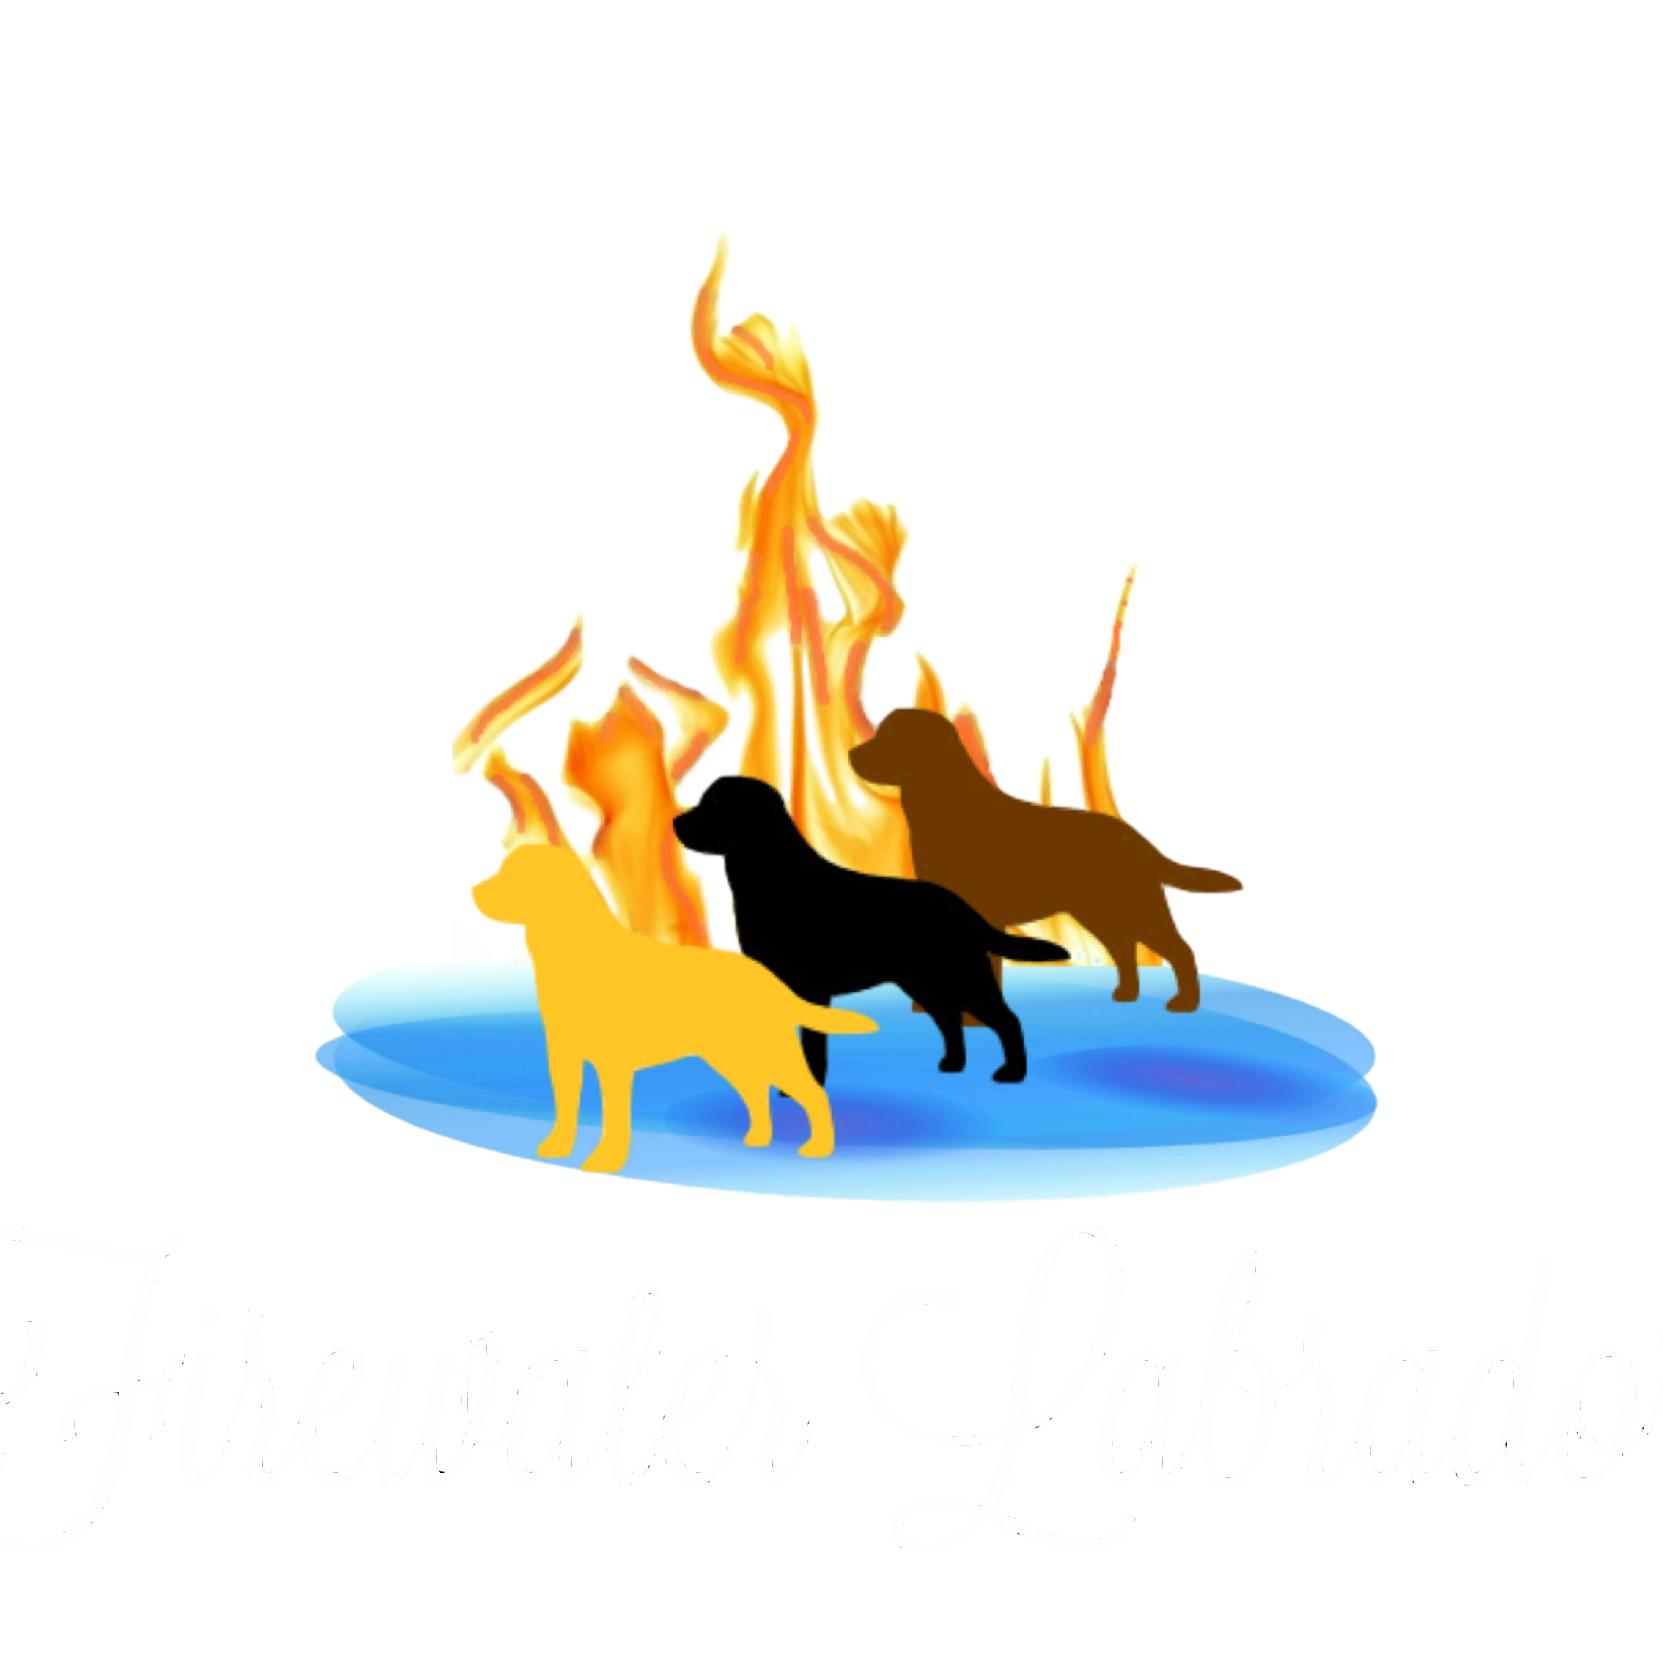 Fire Water Labrador Retrievers image 0